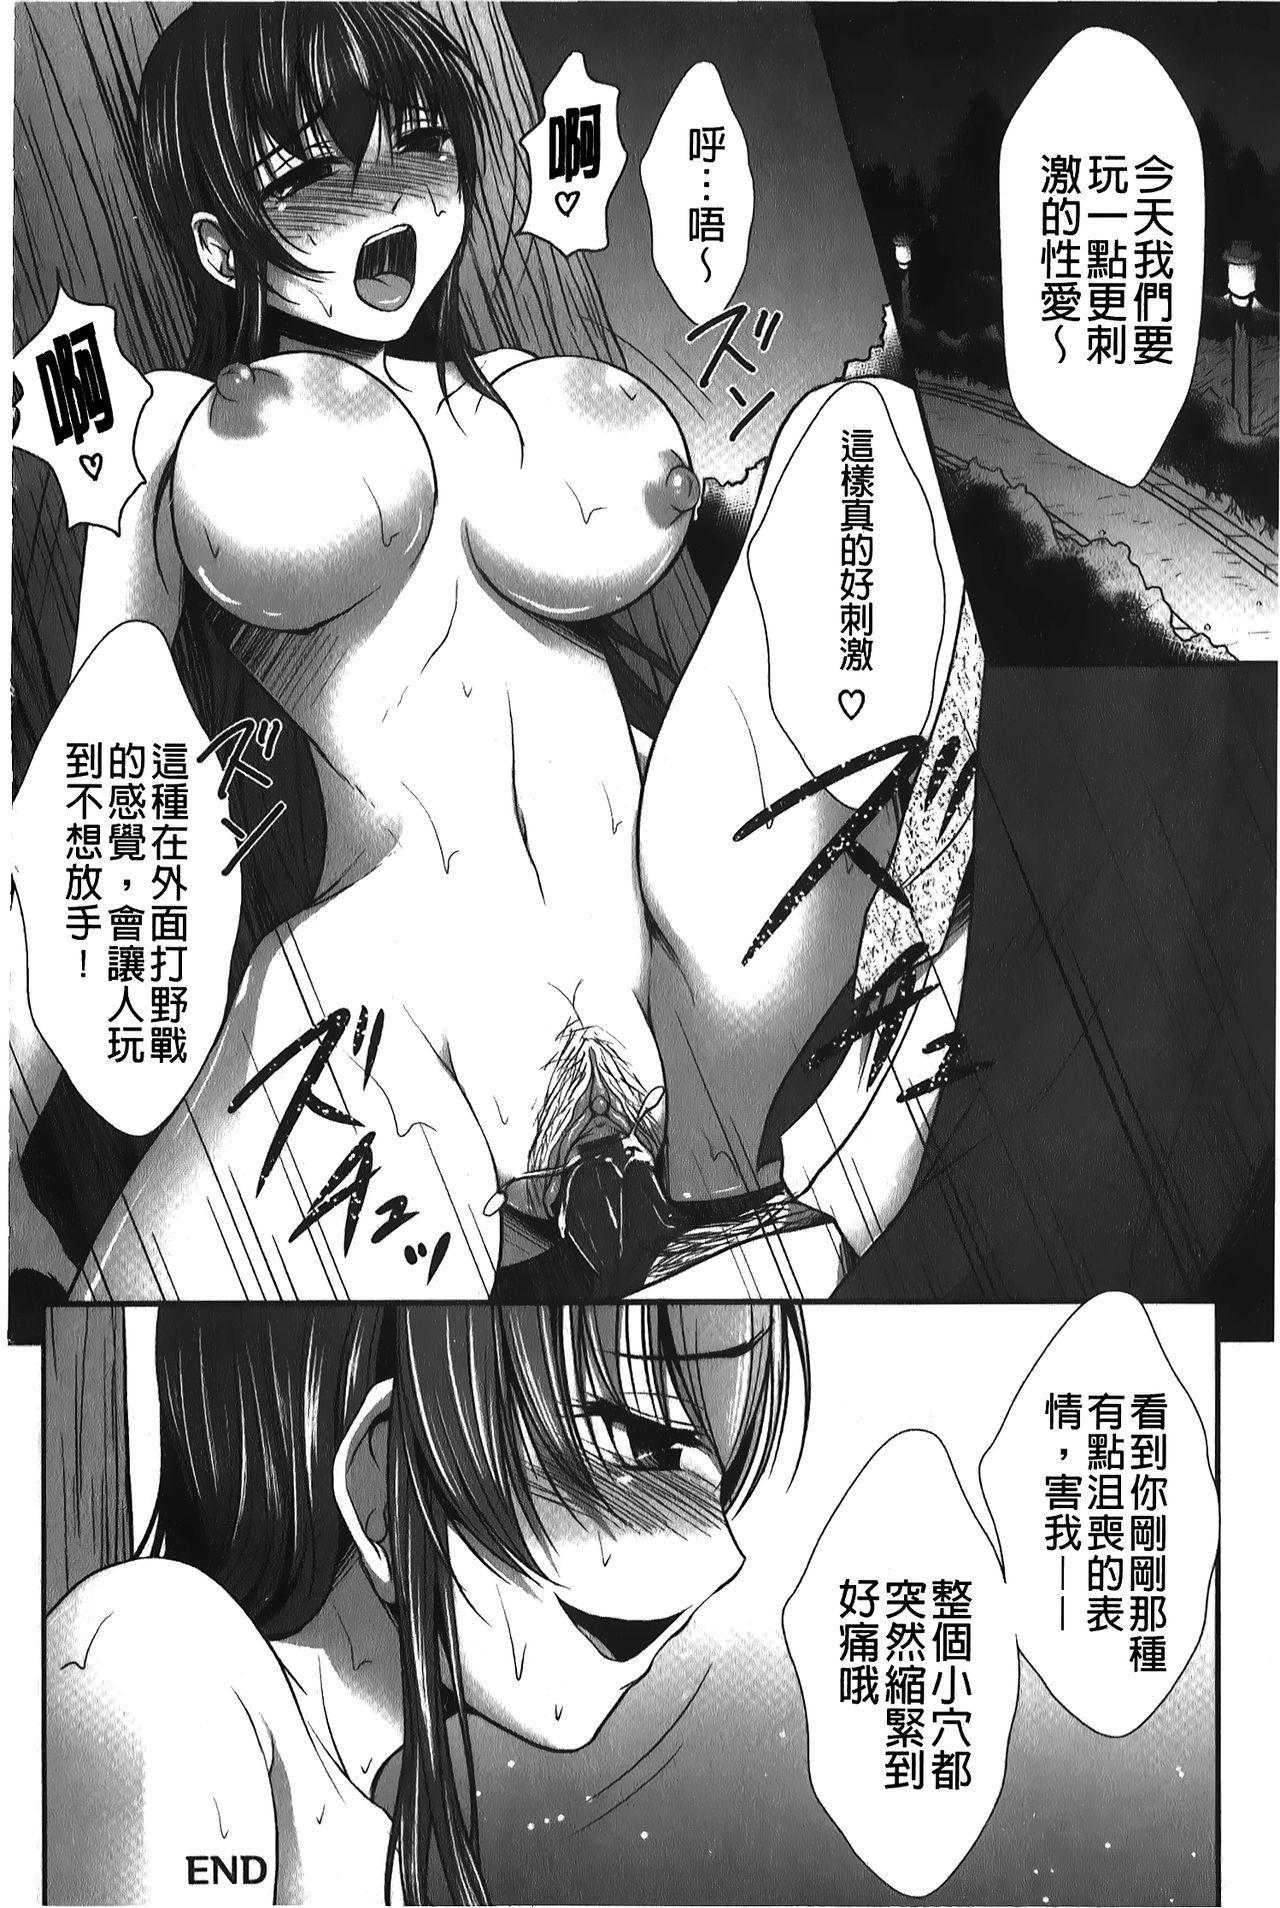 Hameochi | 戳插墮落 164